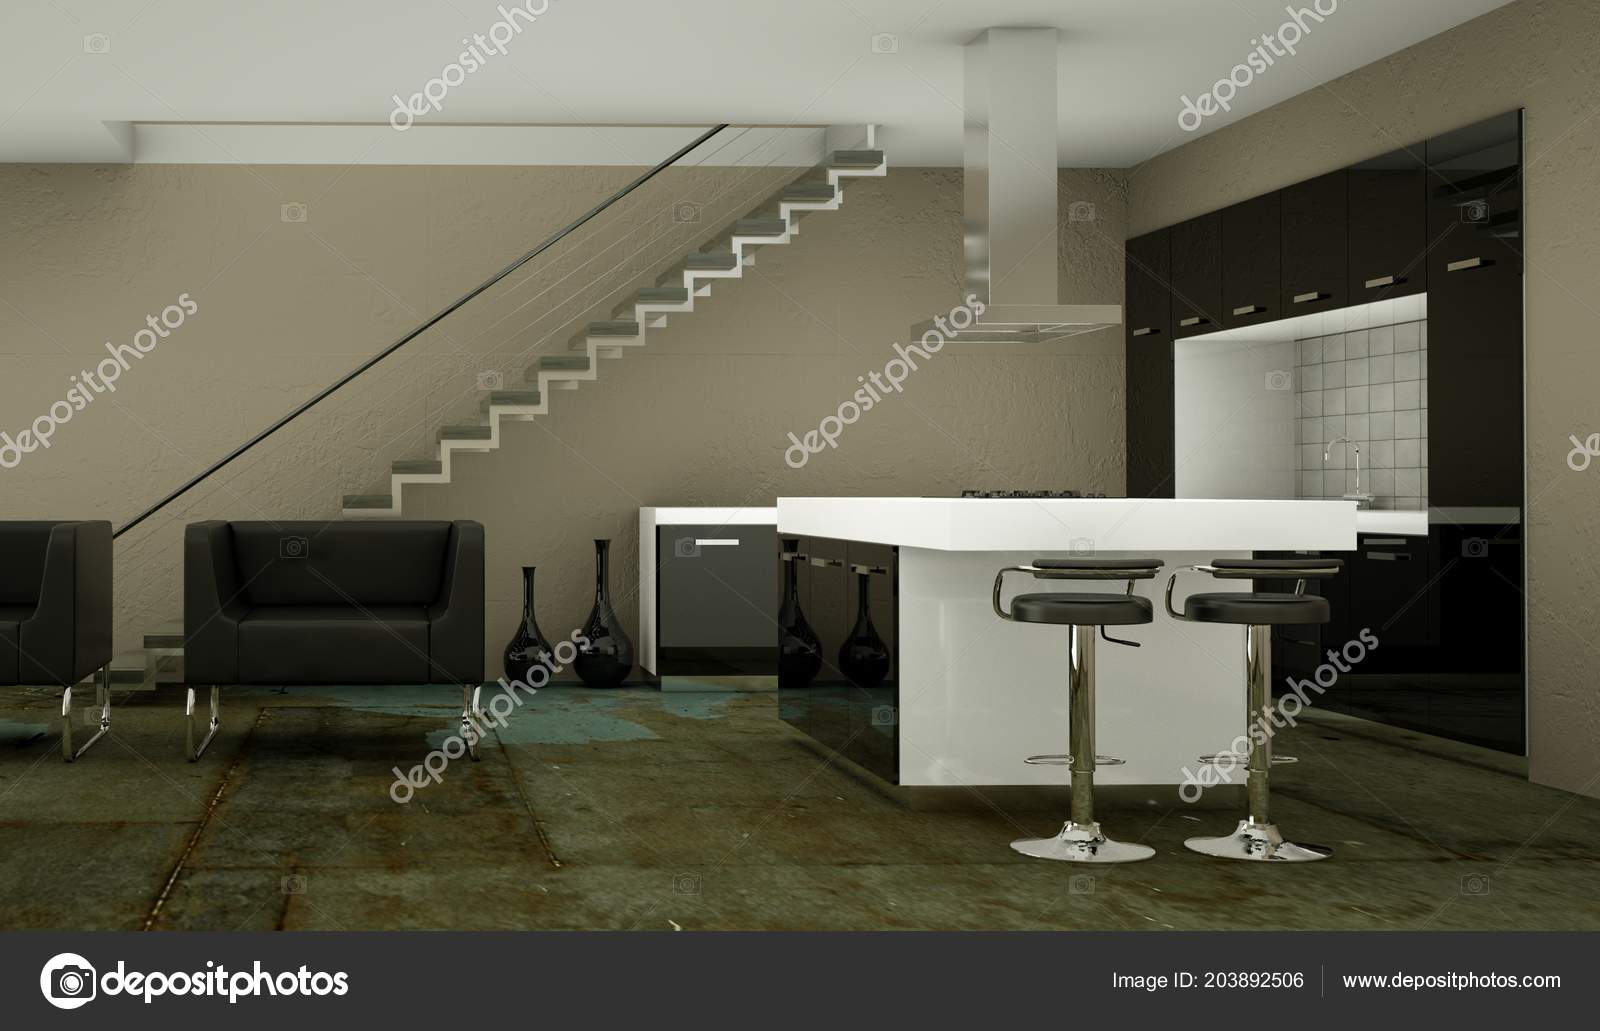 Moderne Keuken Ontwerpen : Moderne keuken in loft met een mooi ontwerp u2014 stockfoto © virtua73